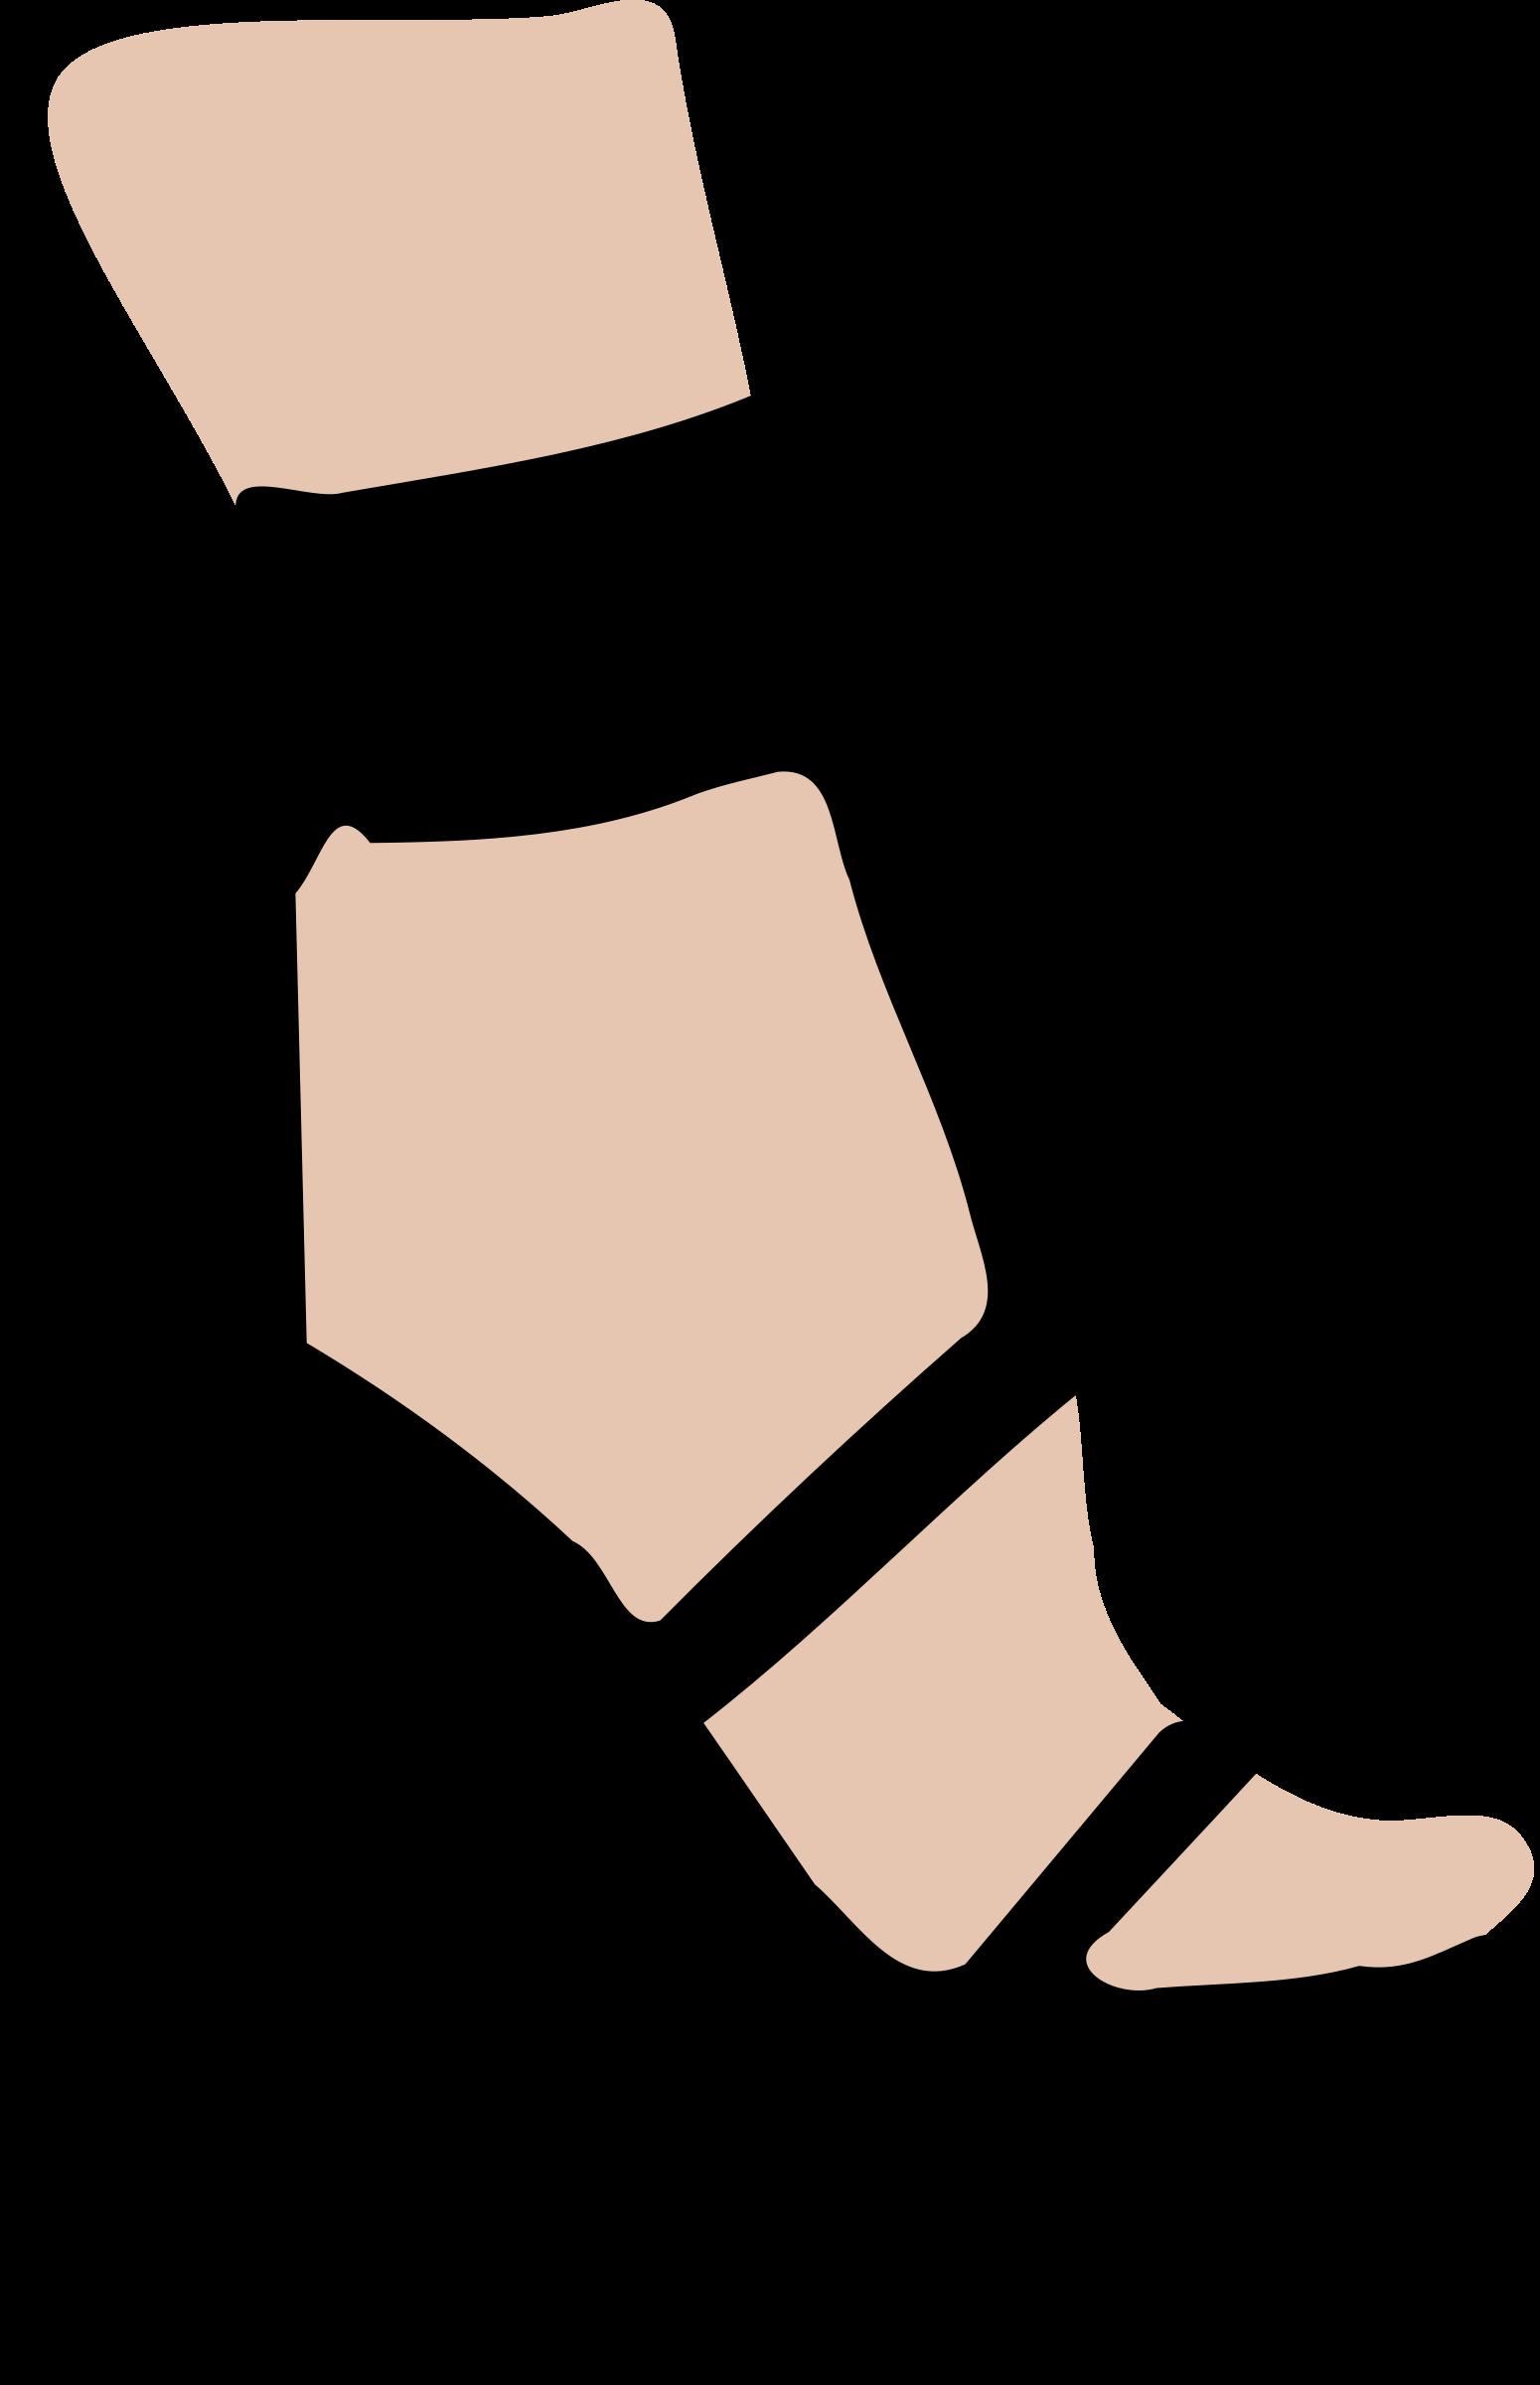 Heels clipart logo. High heeled shoe big